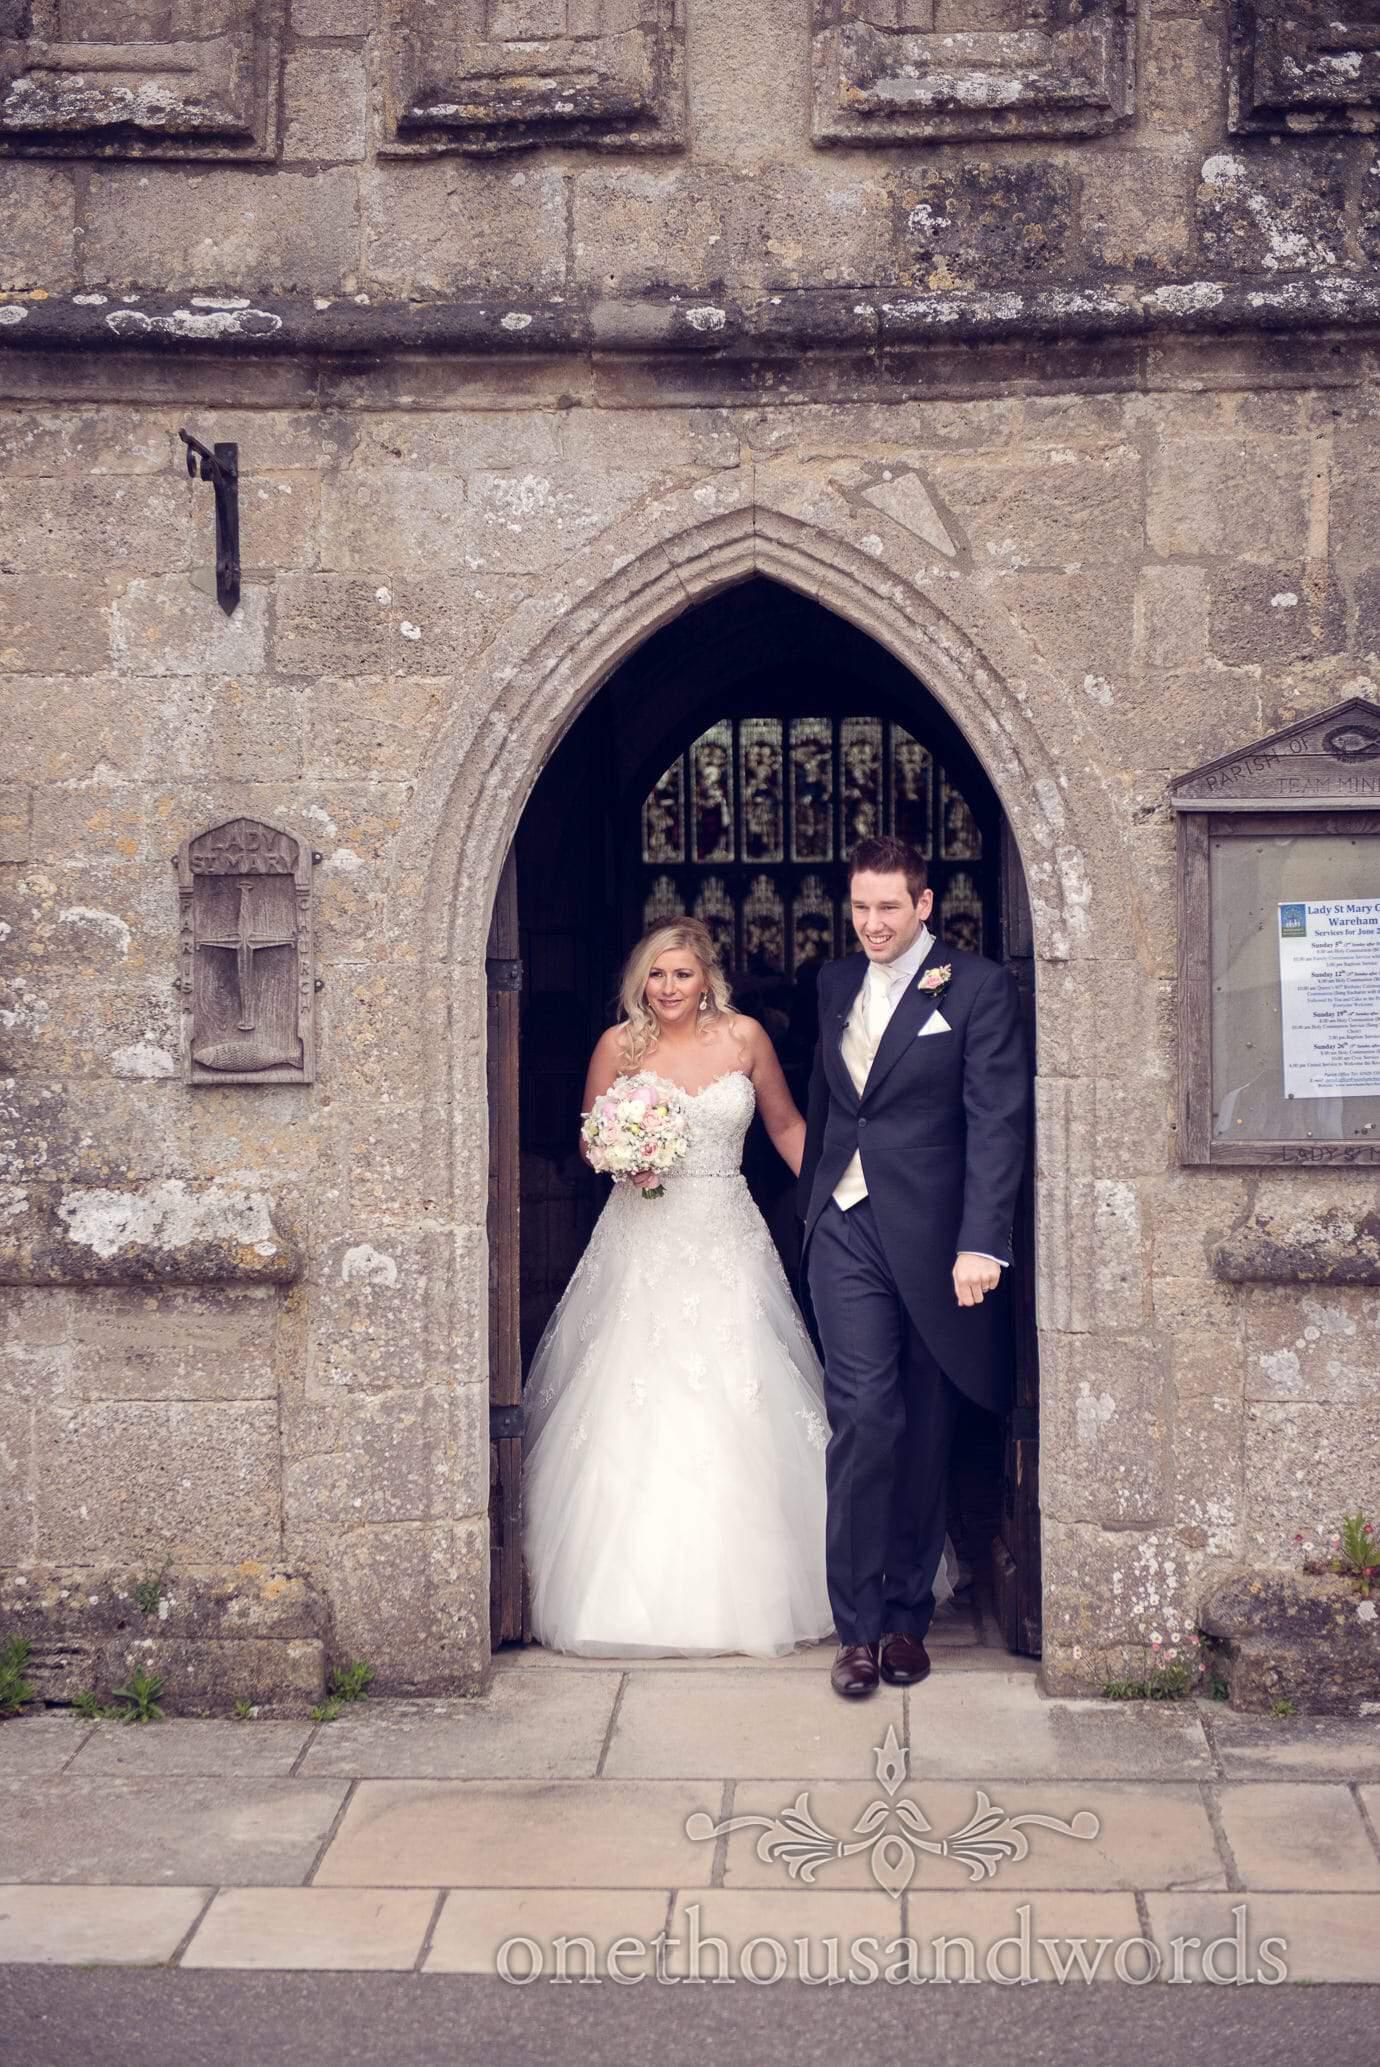 Bride and groom leave St Marys Church wedding in Wareham, Dorset